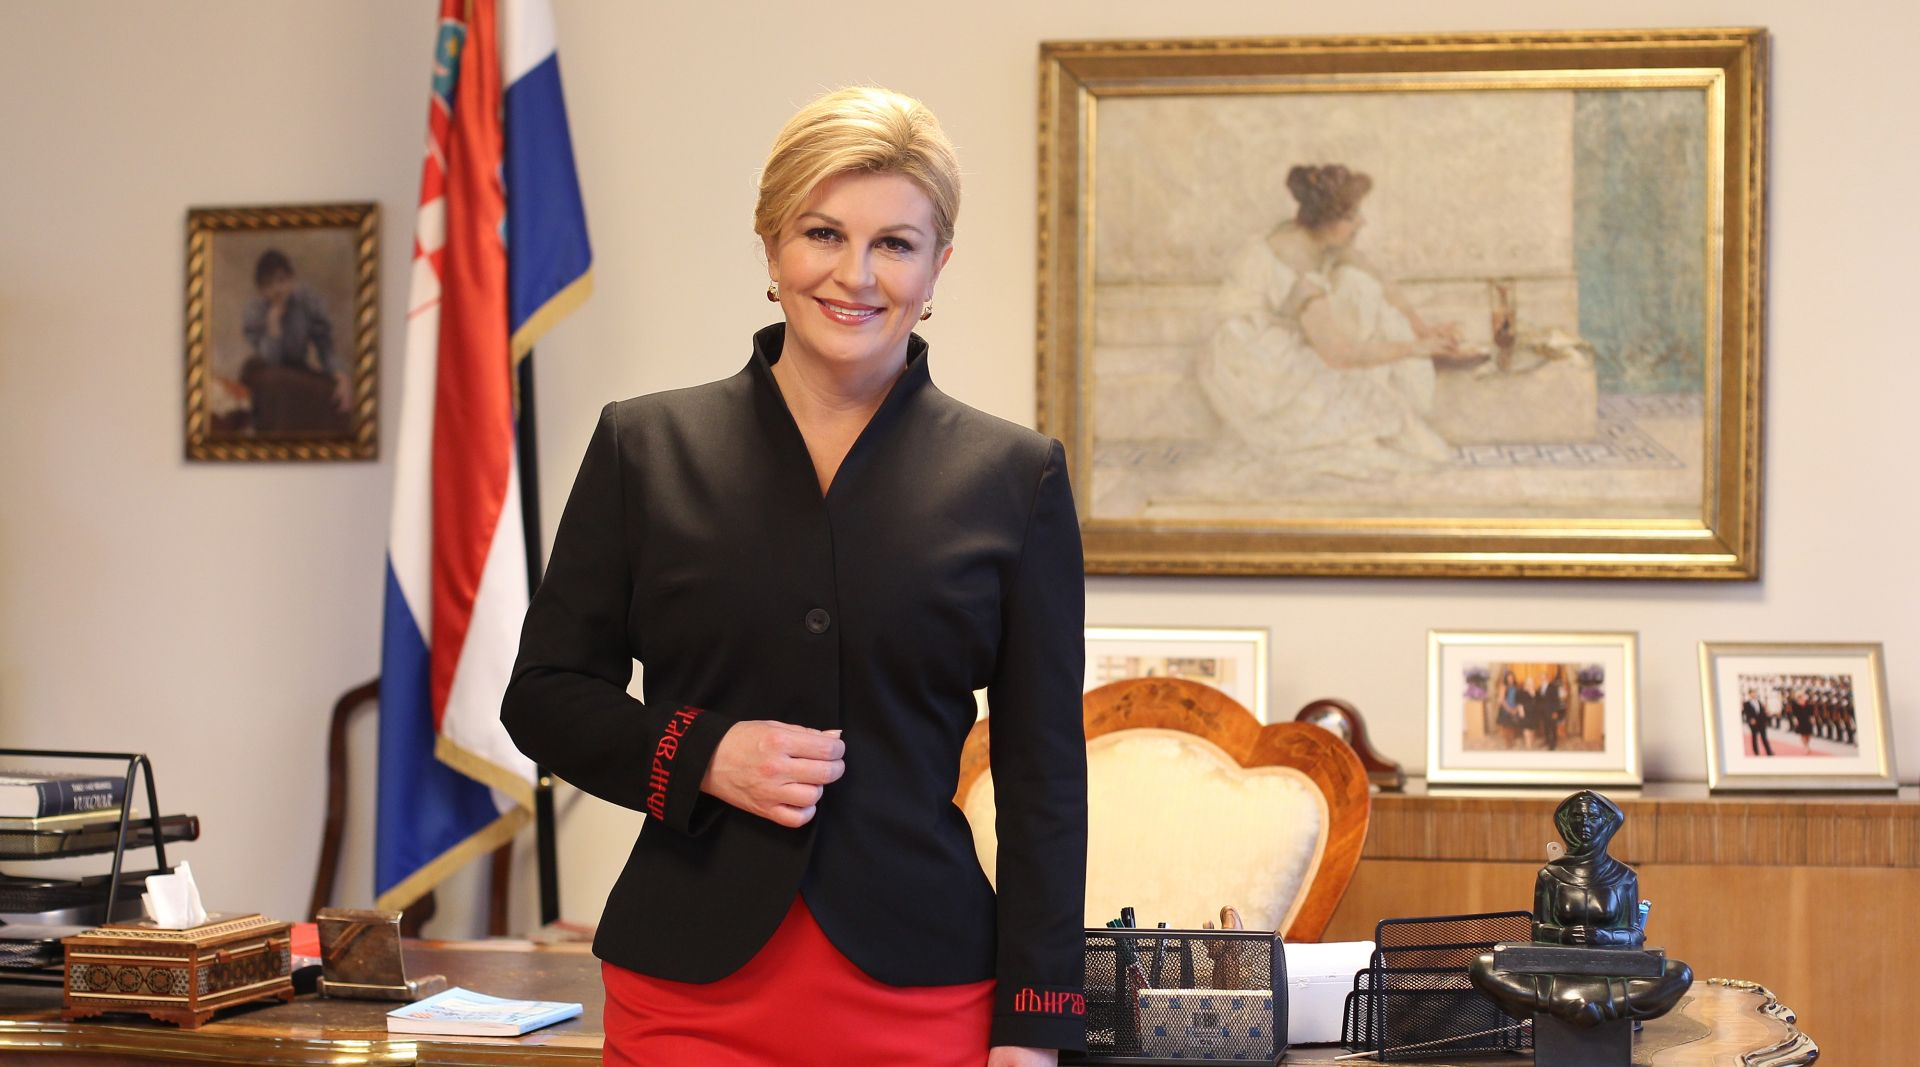 Grabar-Kitarović pozvala stranke na Pantovčak